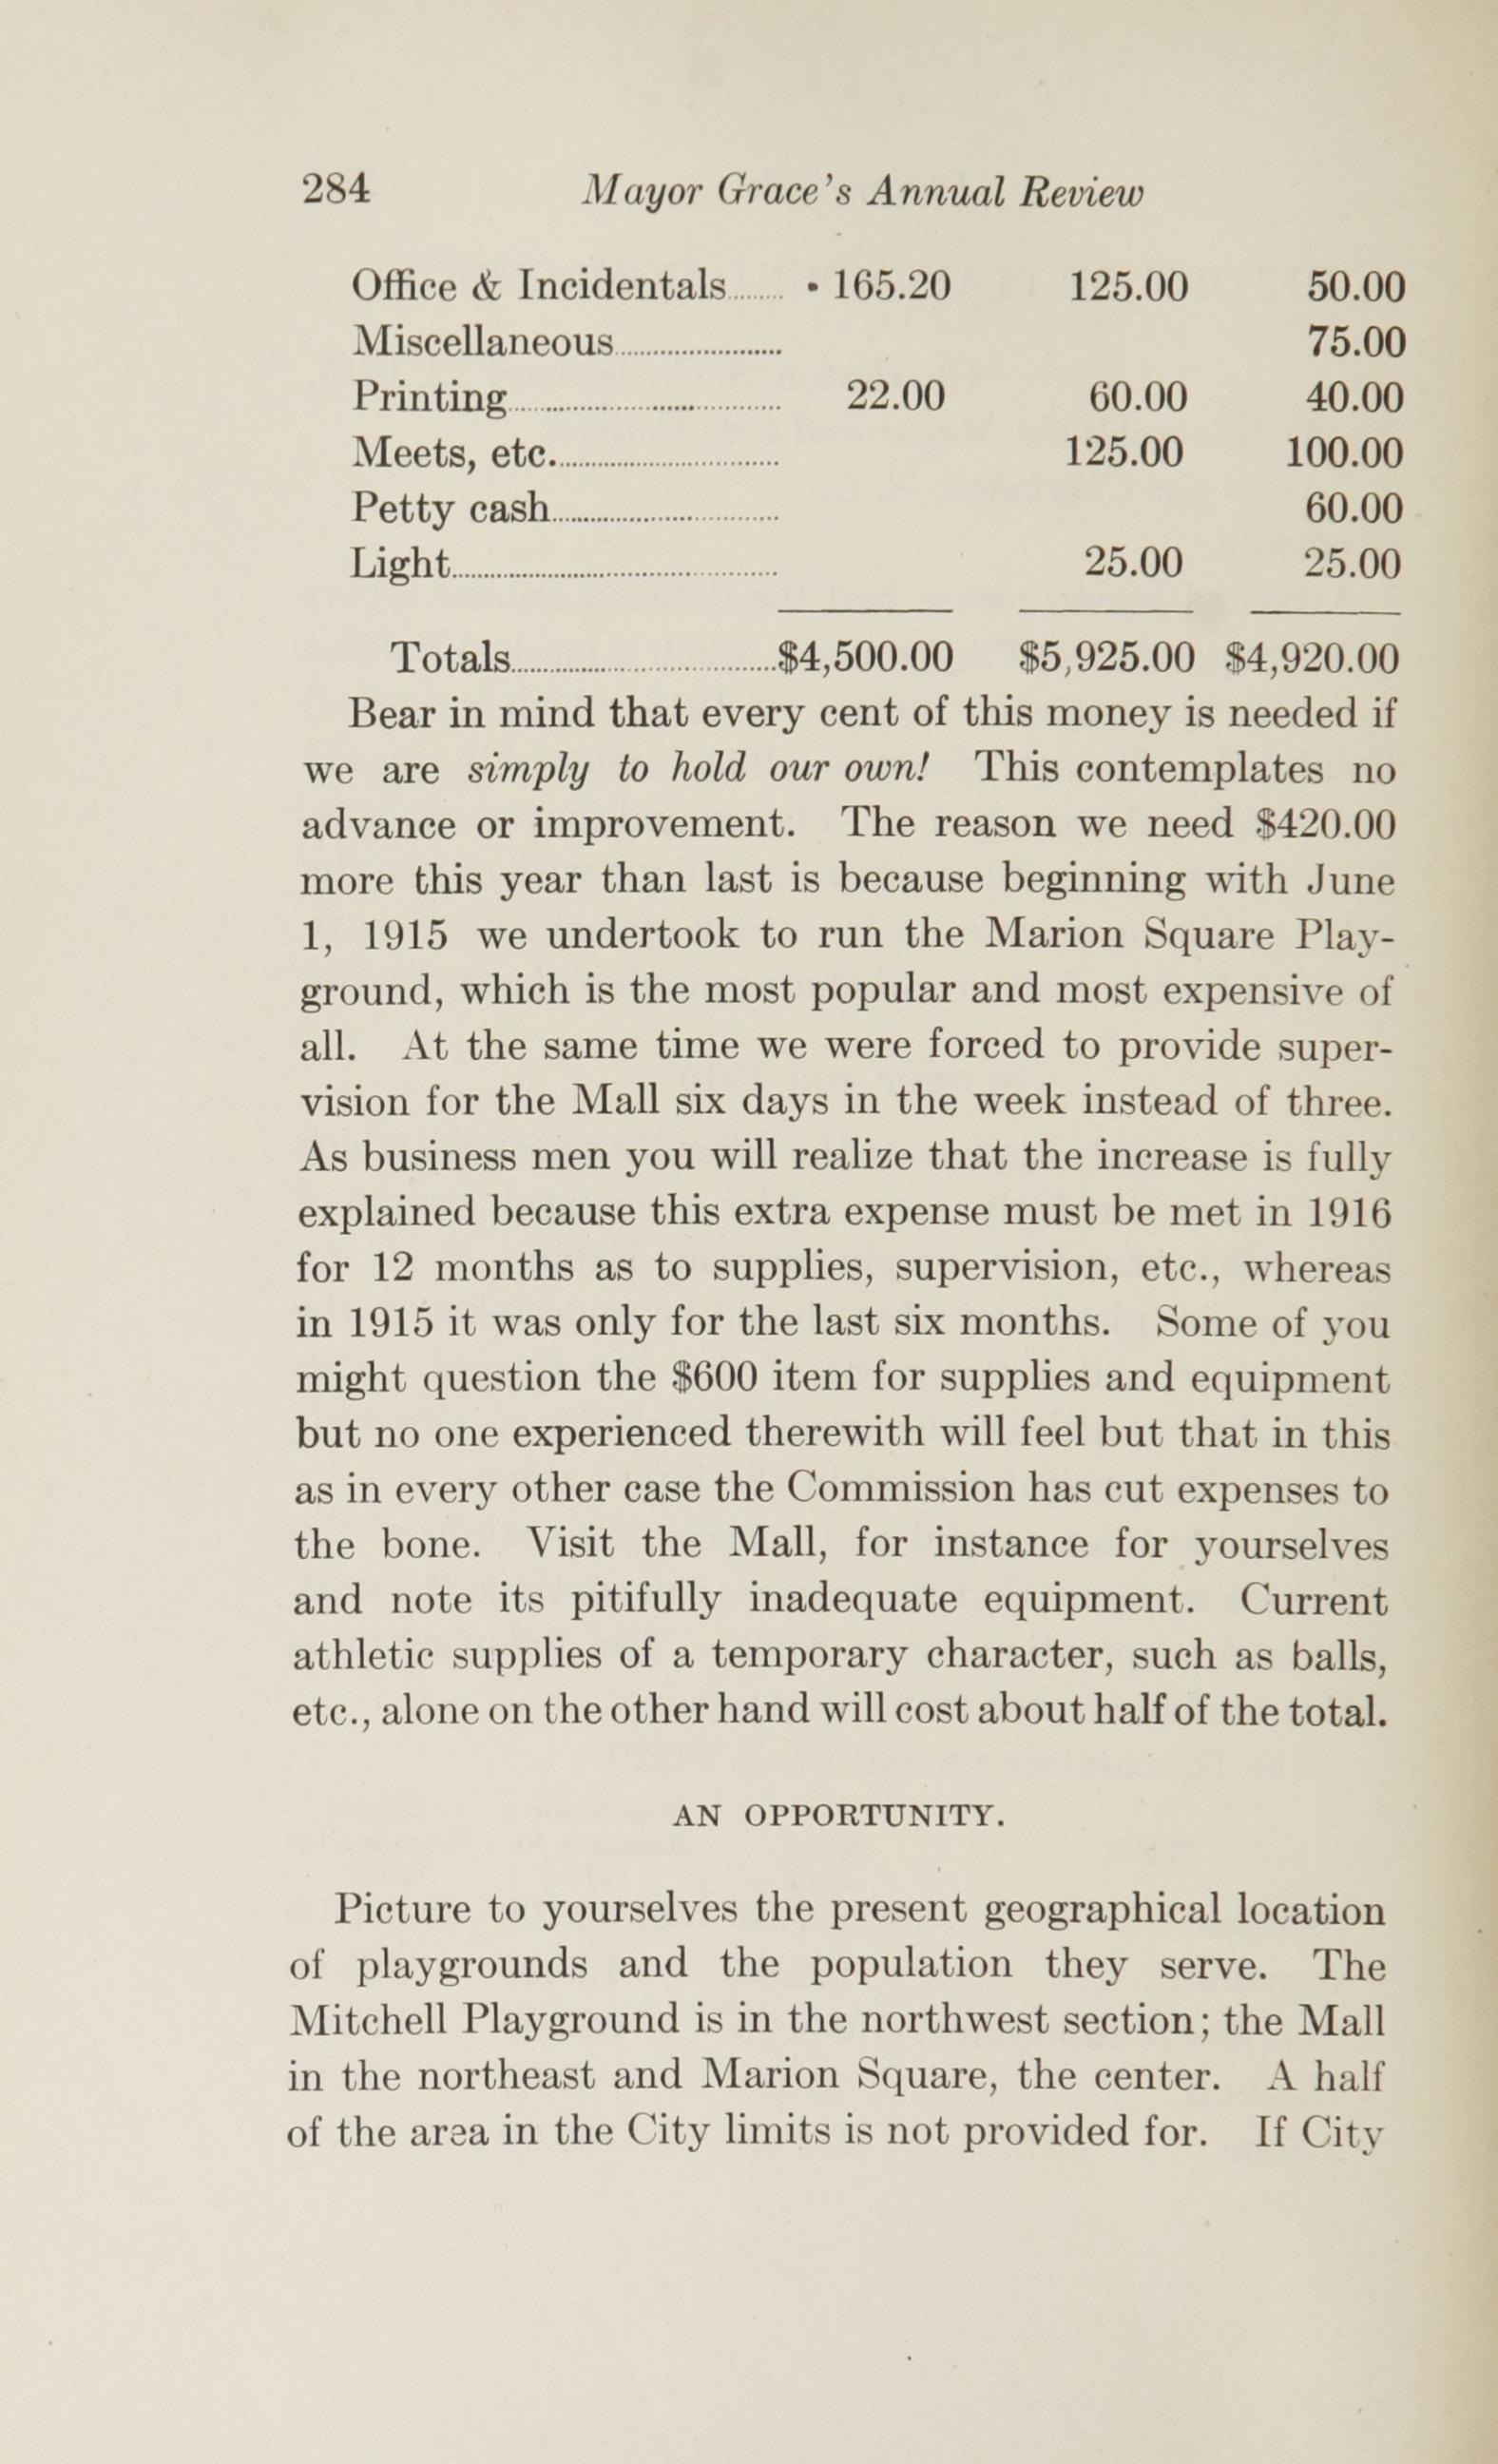 Charleston Yearbook, 1915, page 284